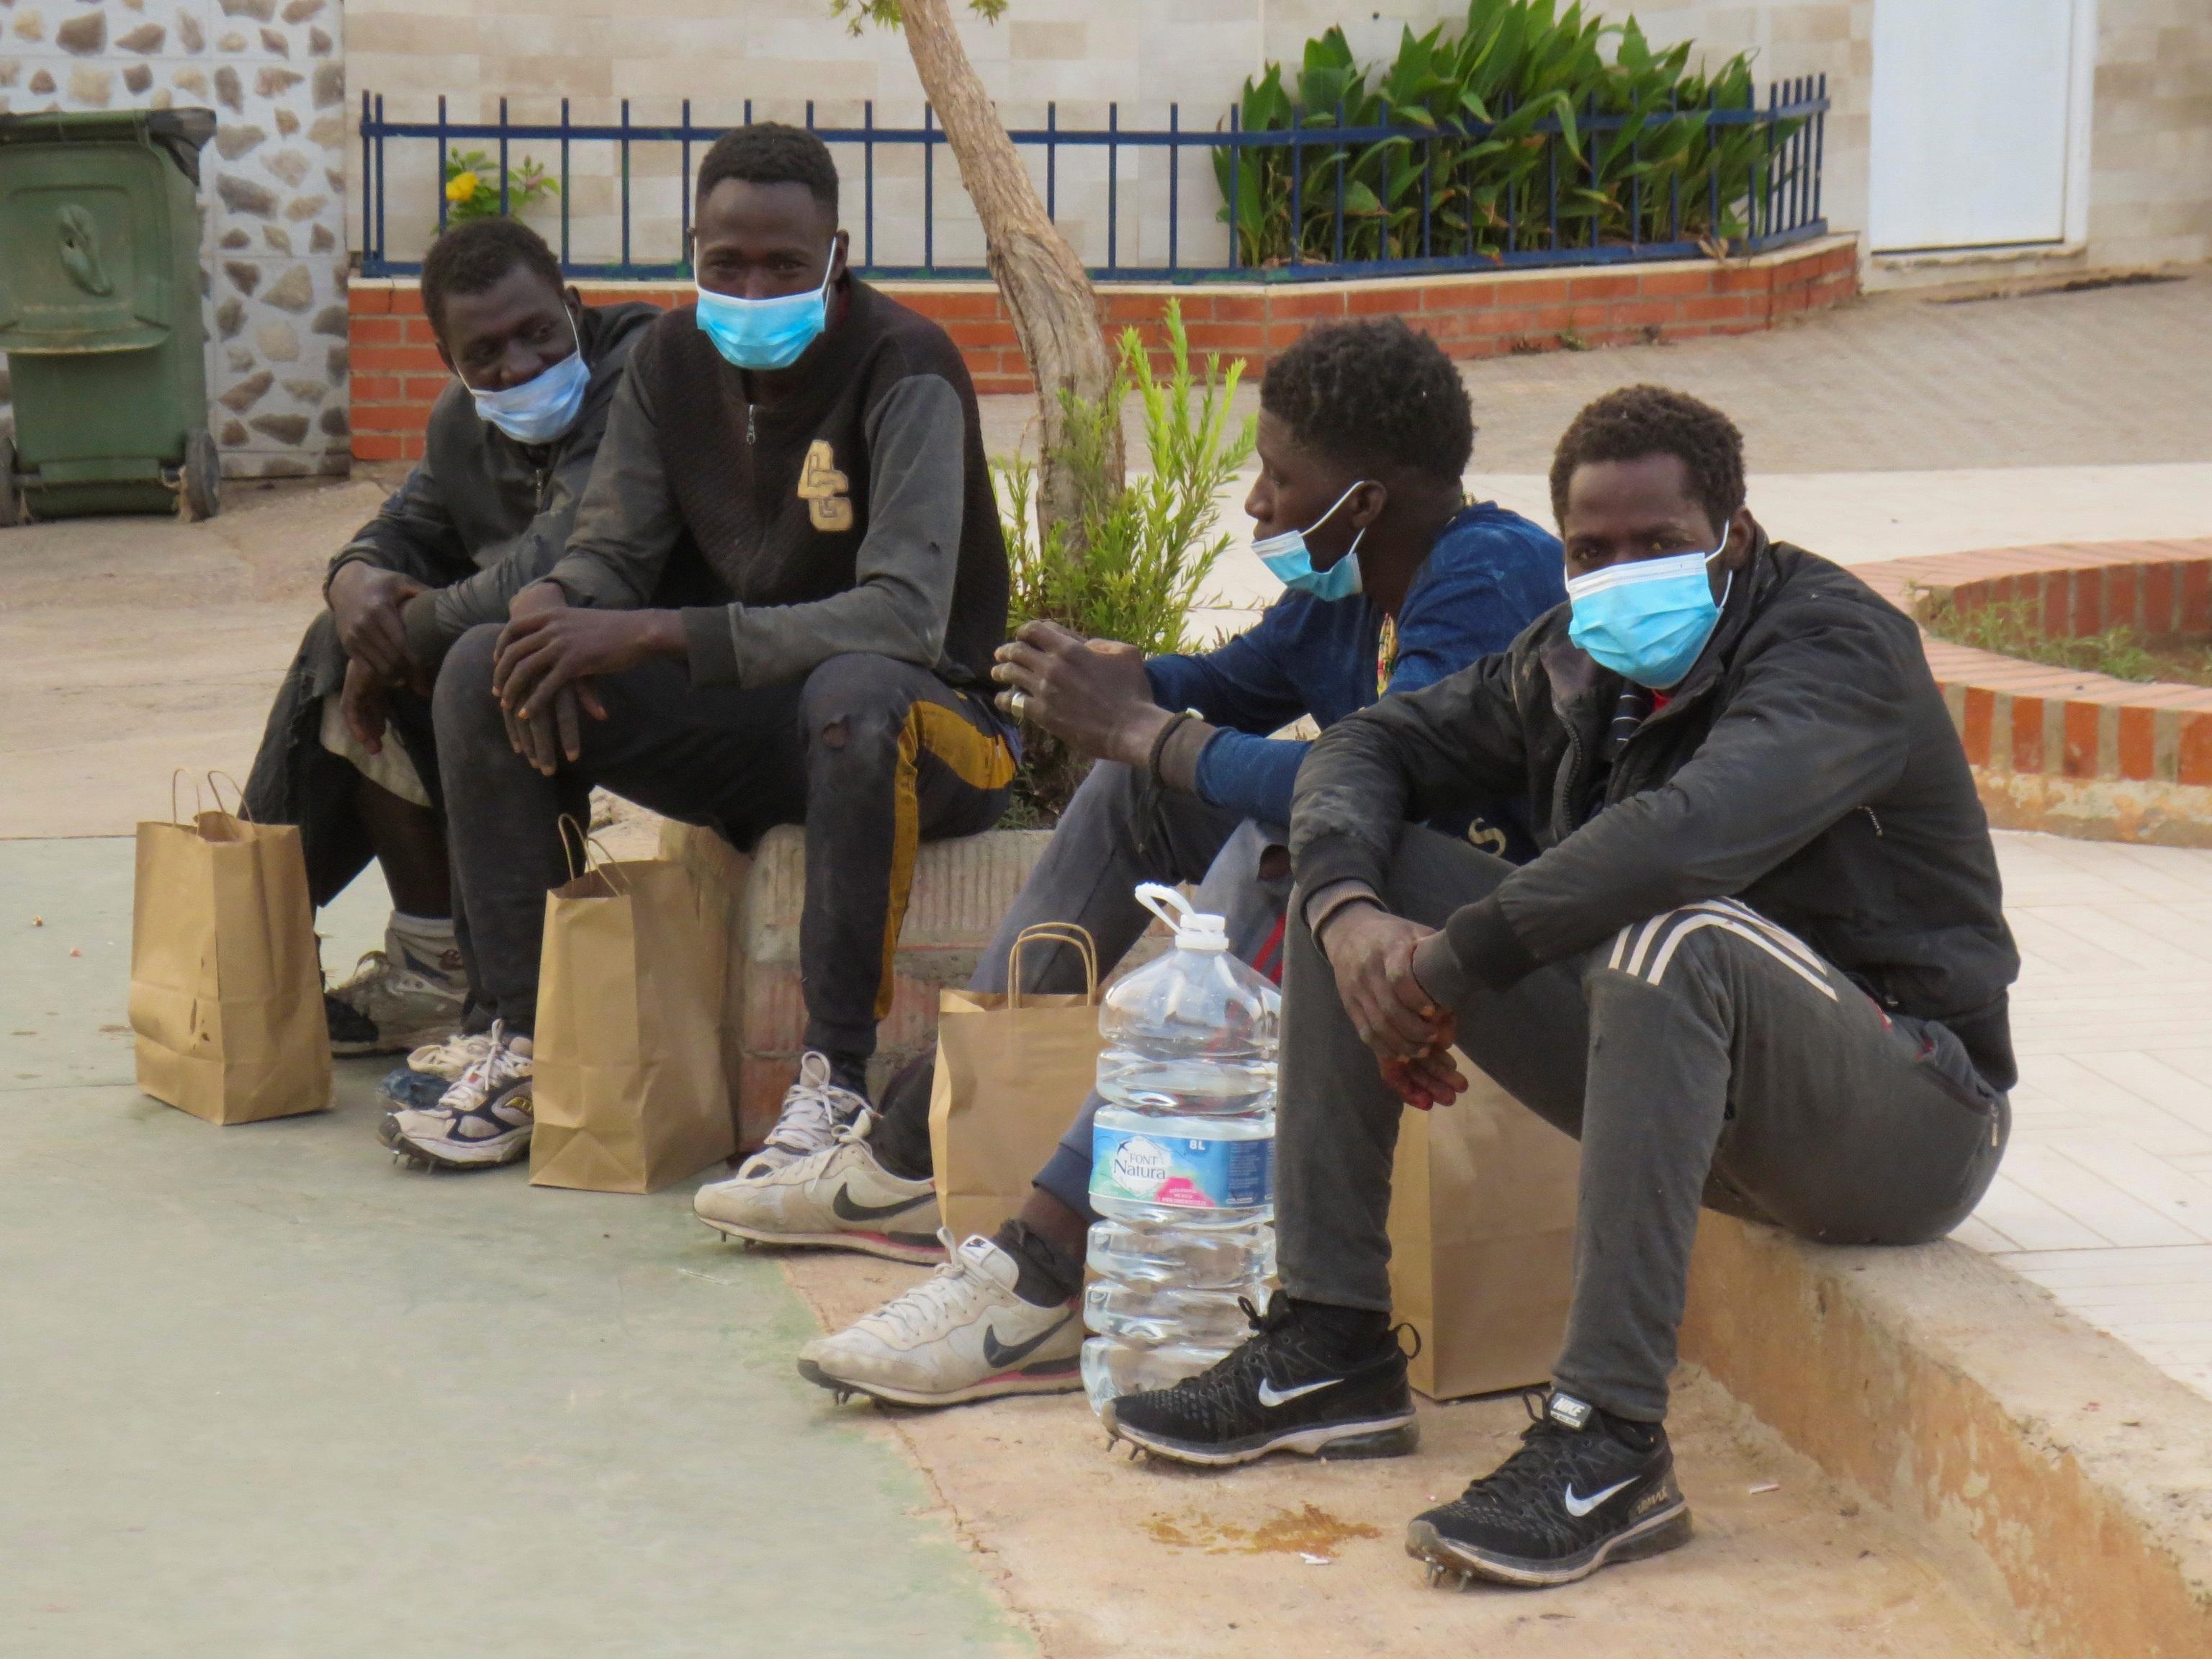 Subsaharianos, este domingo, en Melilla.